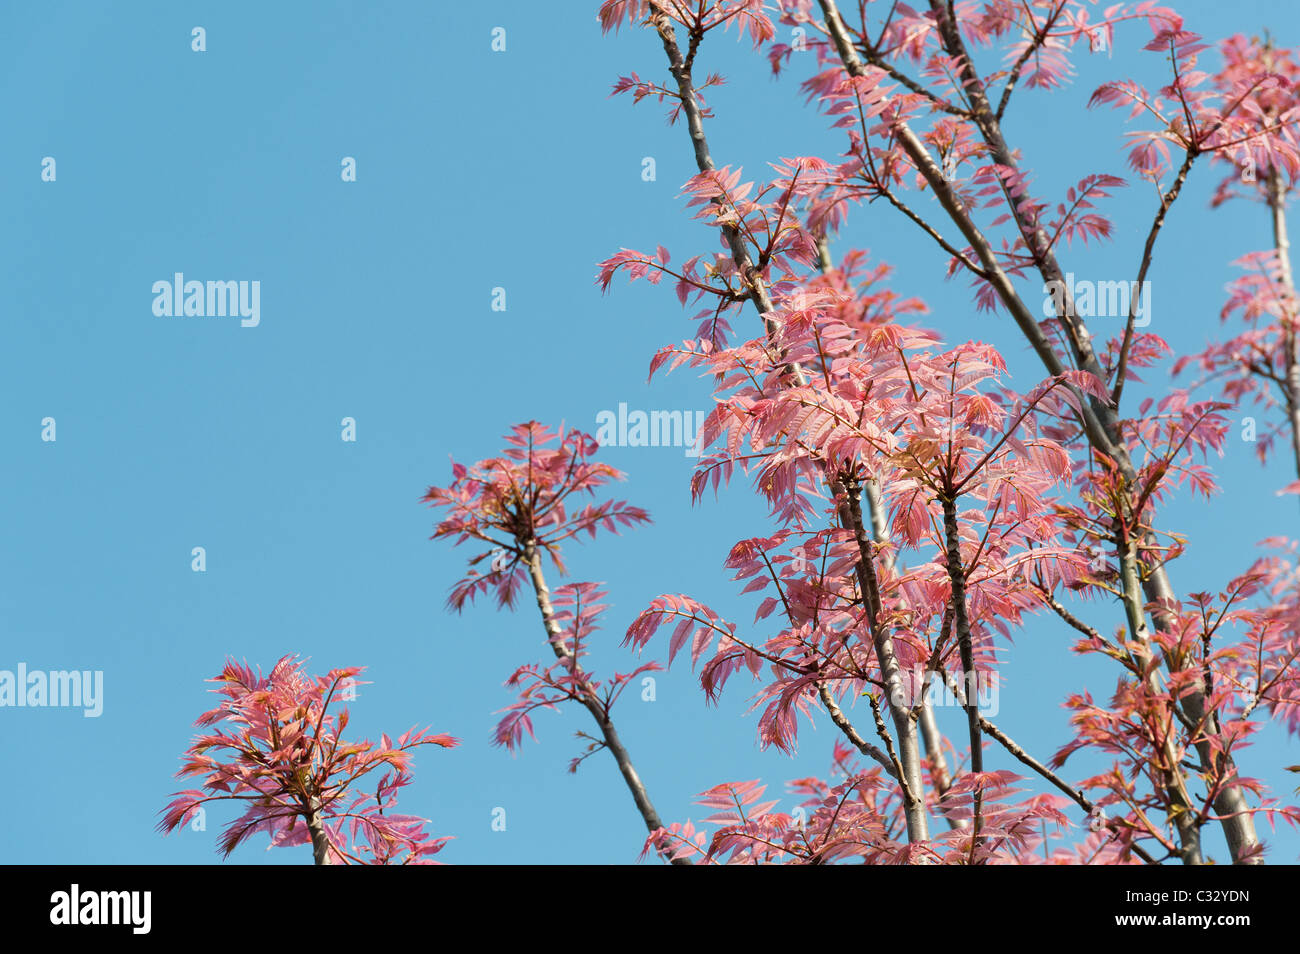 toona sinensis 39 flamingo 39 chinesische mahagoni 39 flamingo 39 baum mit rosa bl ttern im fr hjahr. Black Bedroom Furniture Sets. Home Design Ideas